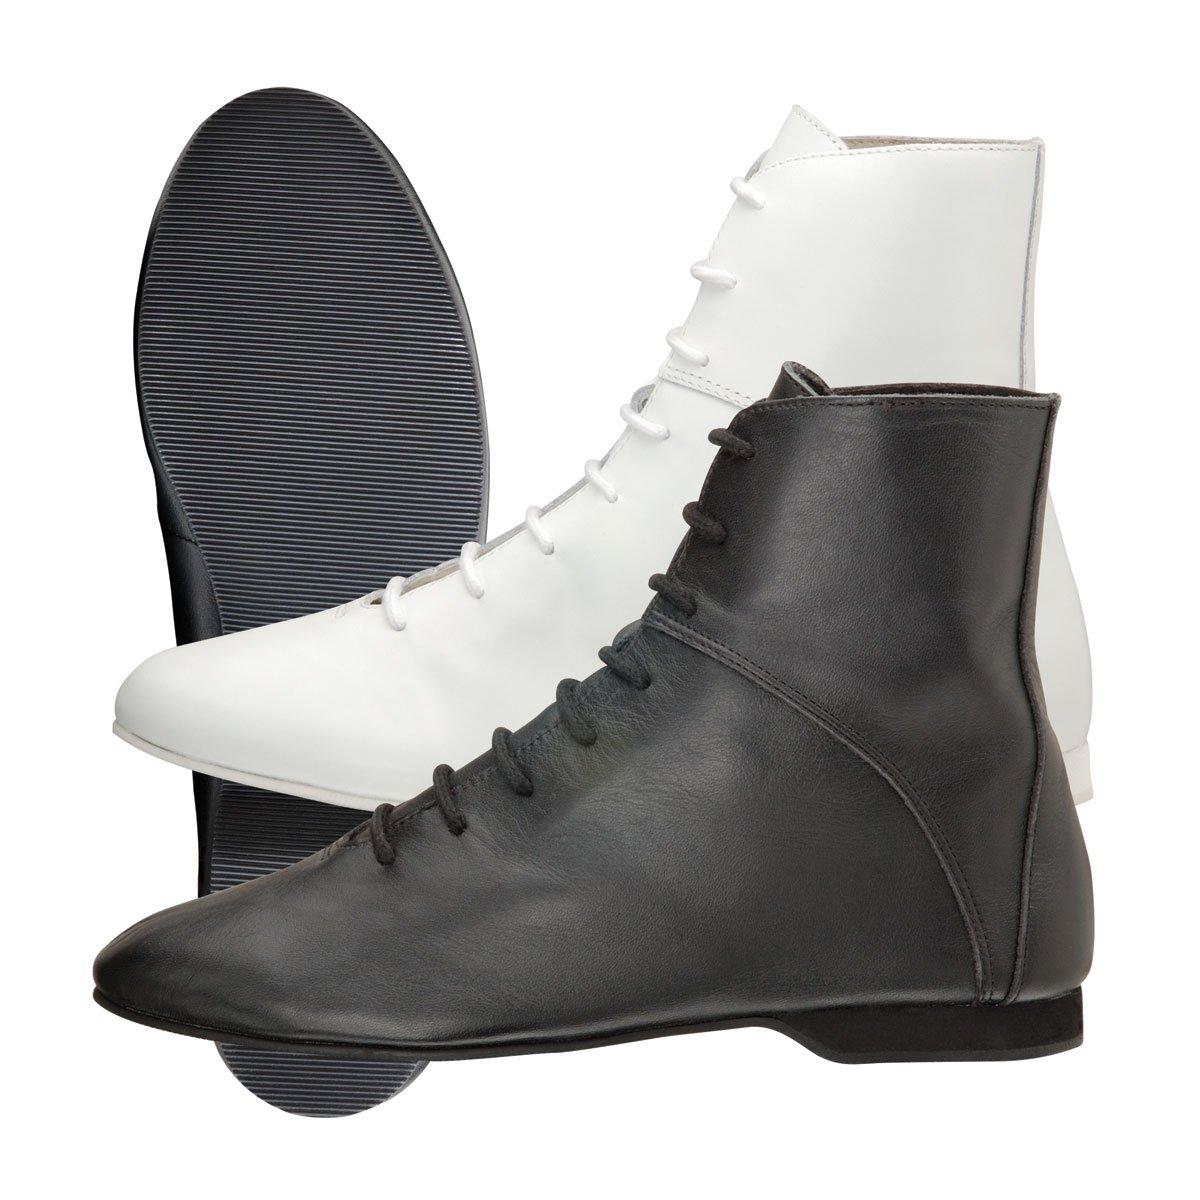 StylePlus Women's Paramount Dance Boot 8.5 Black